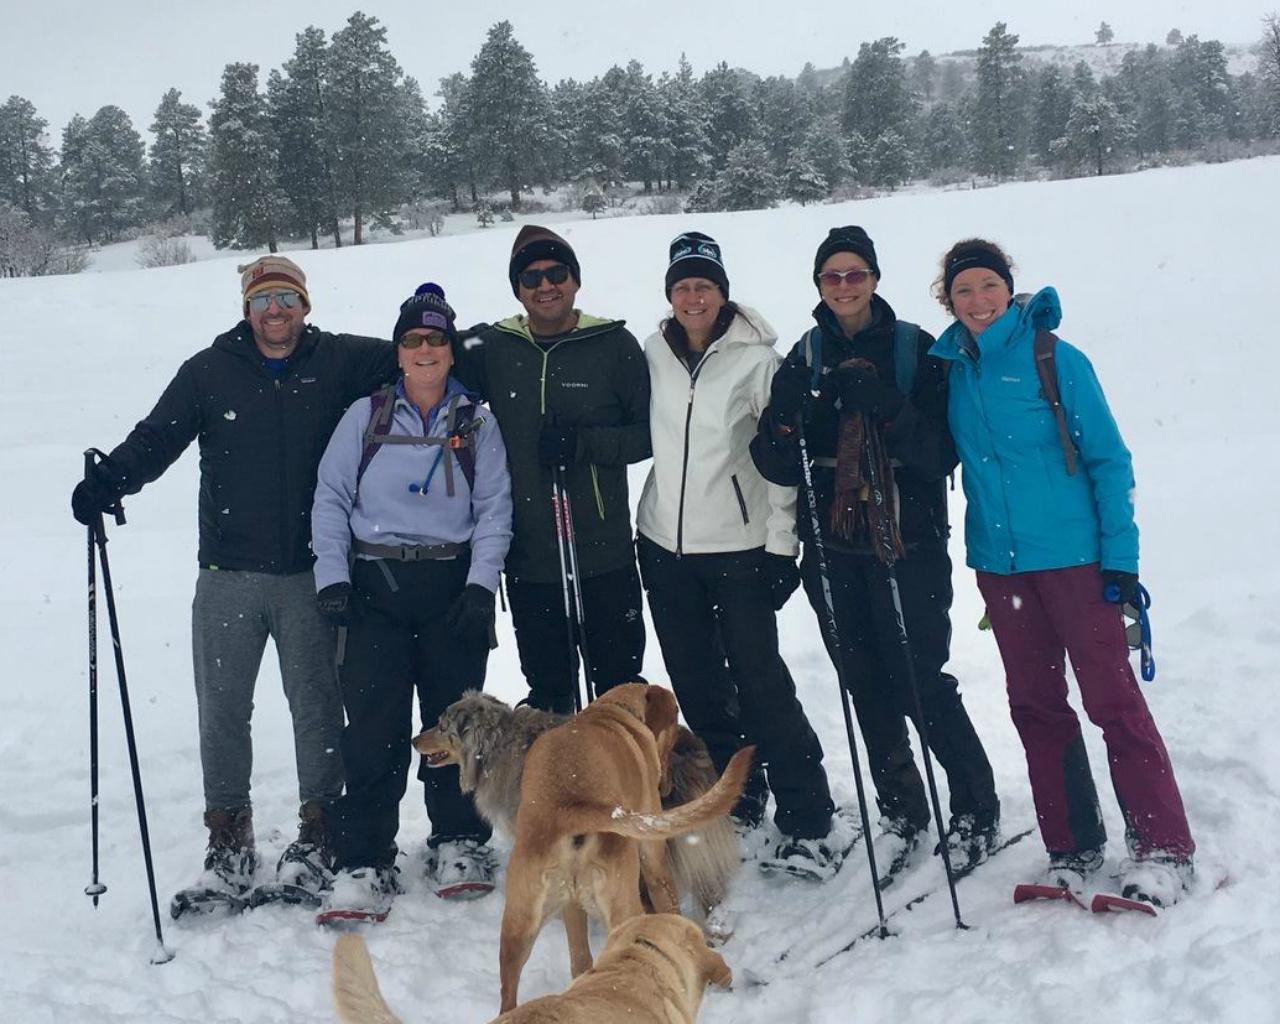 group-snowshoe-1280